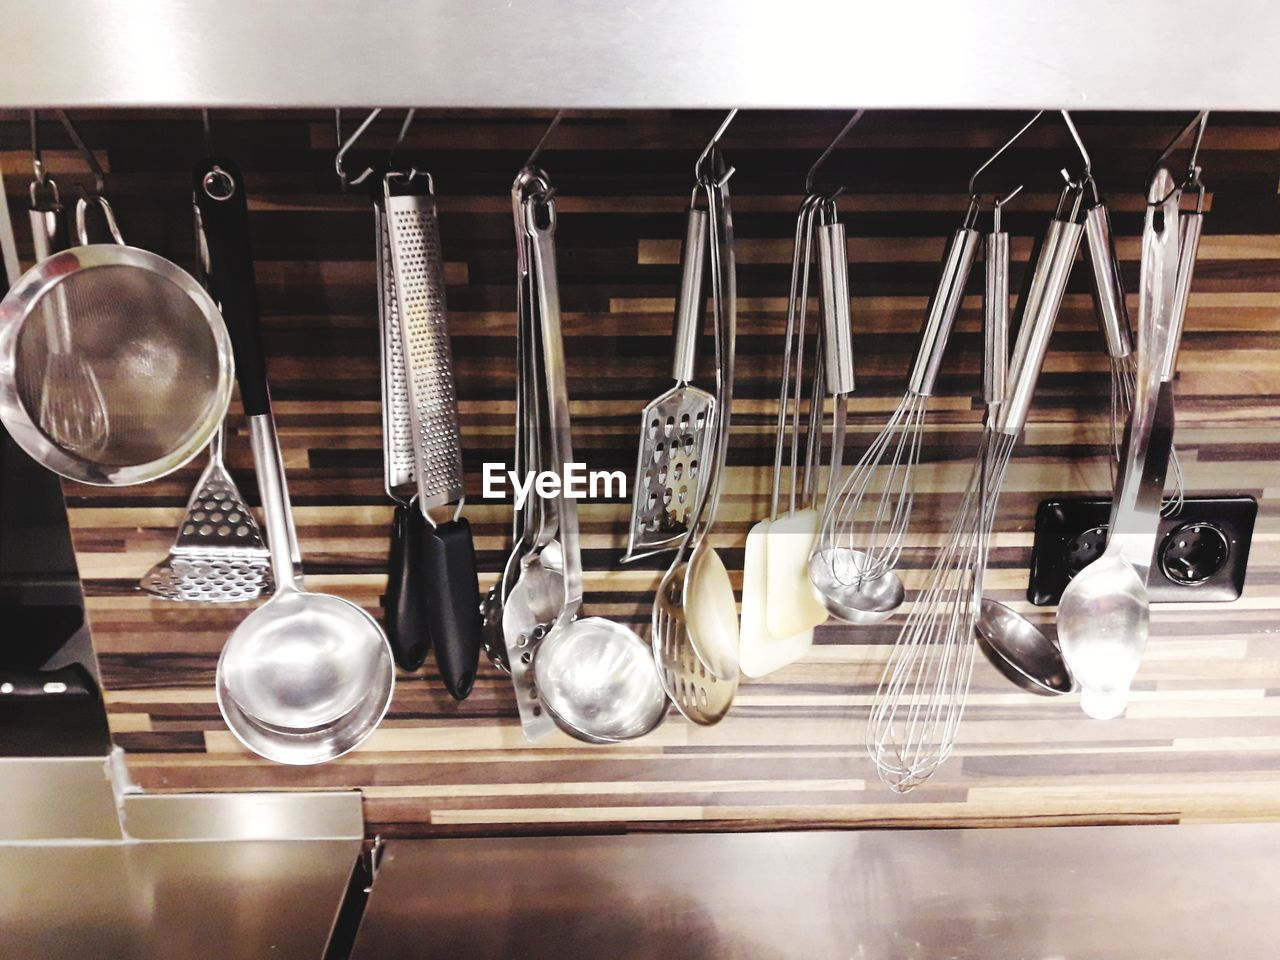 Close-up of kitchen utensils hanging on rack